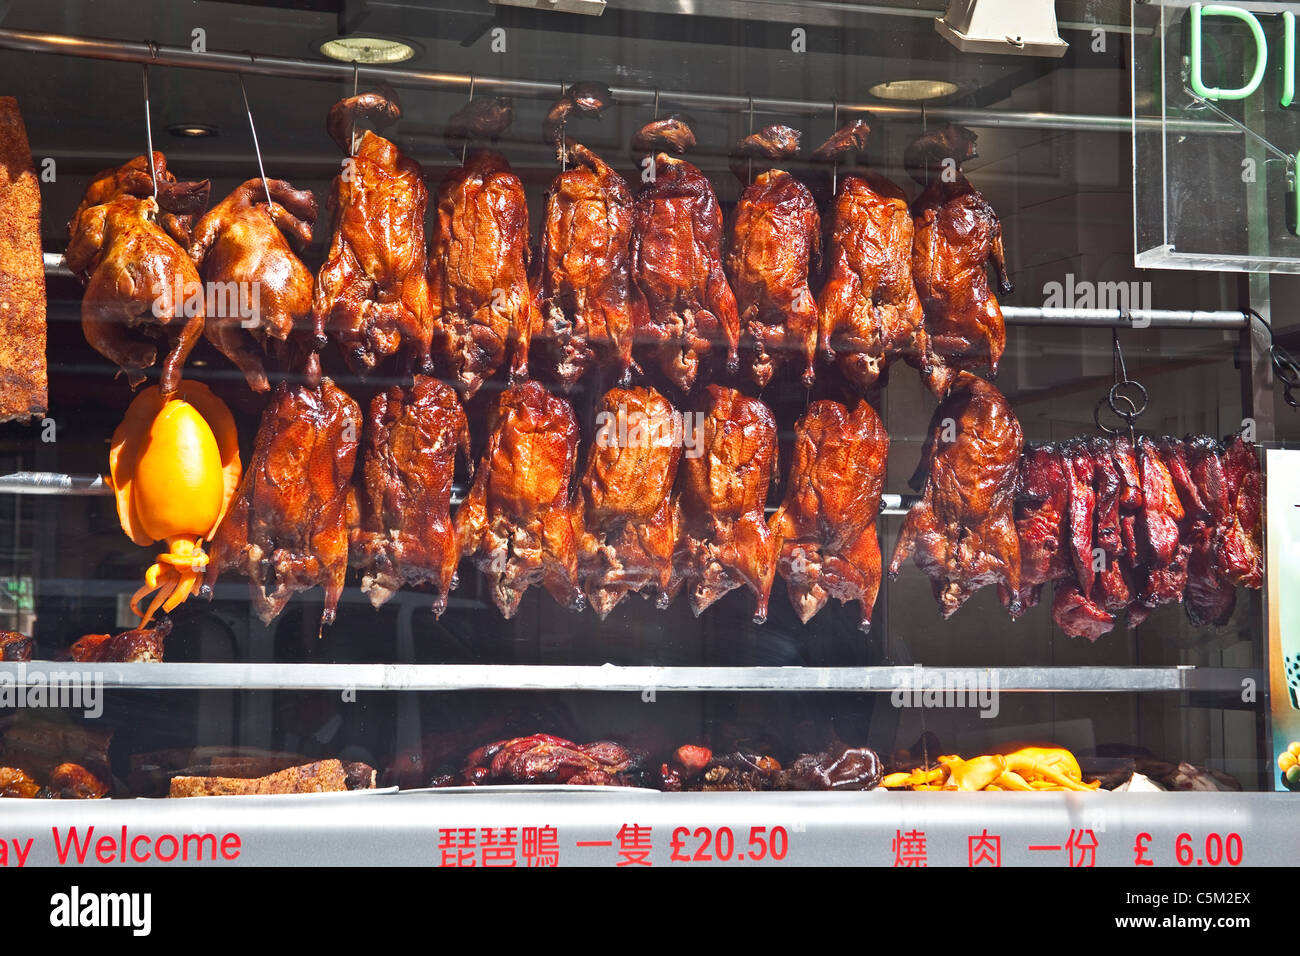 Gerrard Street London Chinese Restaurant